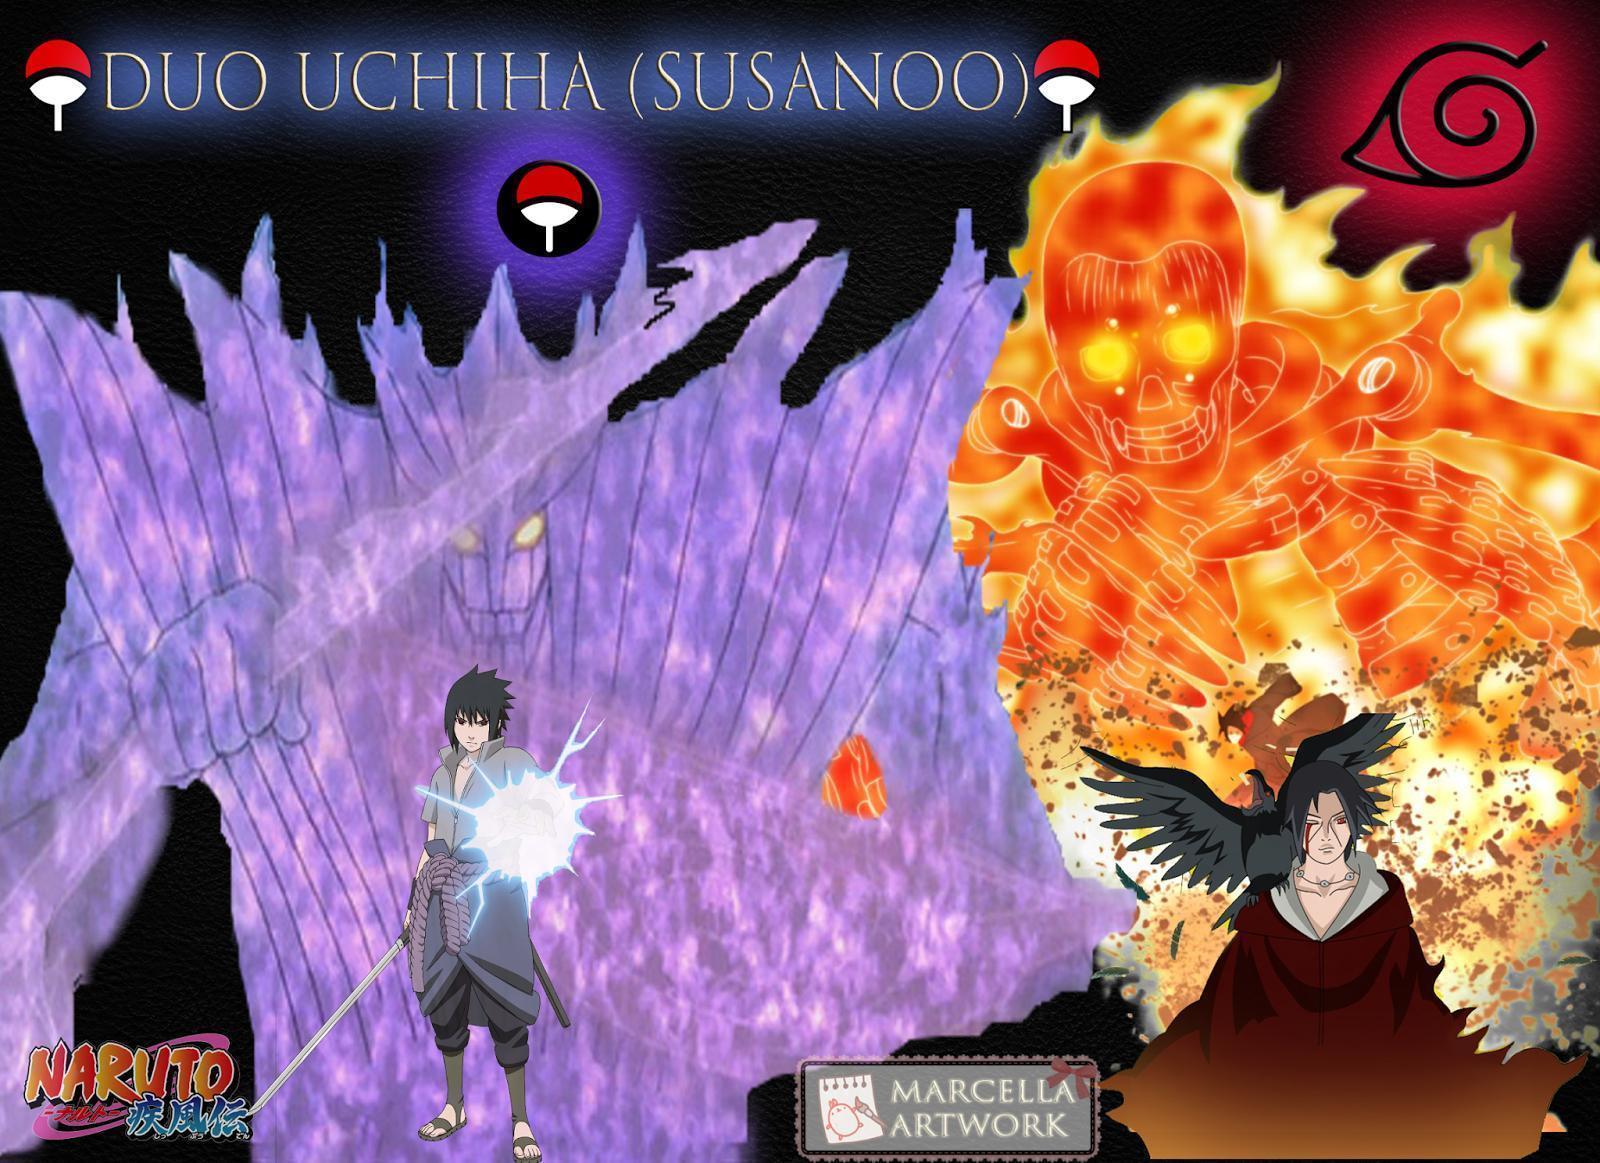 Wallpapers For Itachi And Sasuke Susanoo Wallpaper